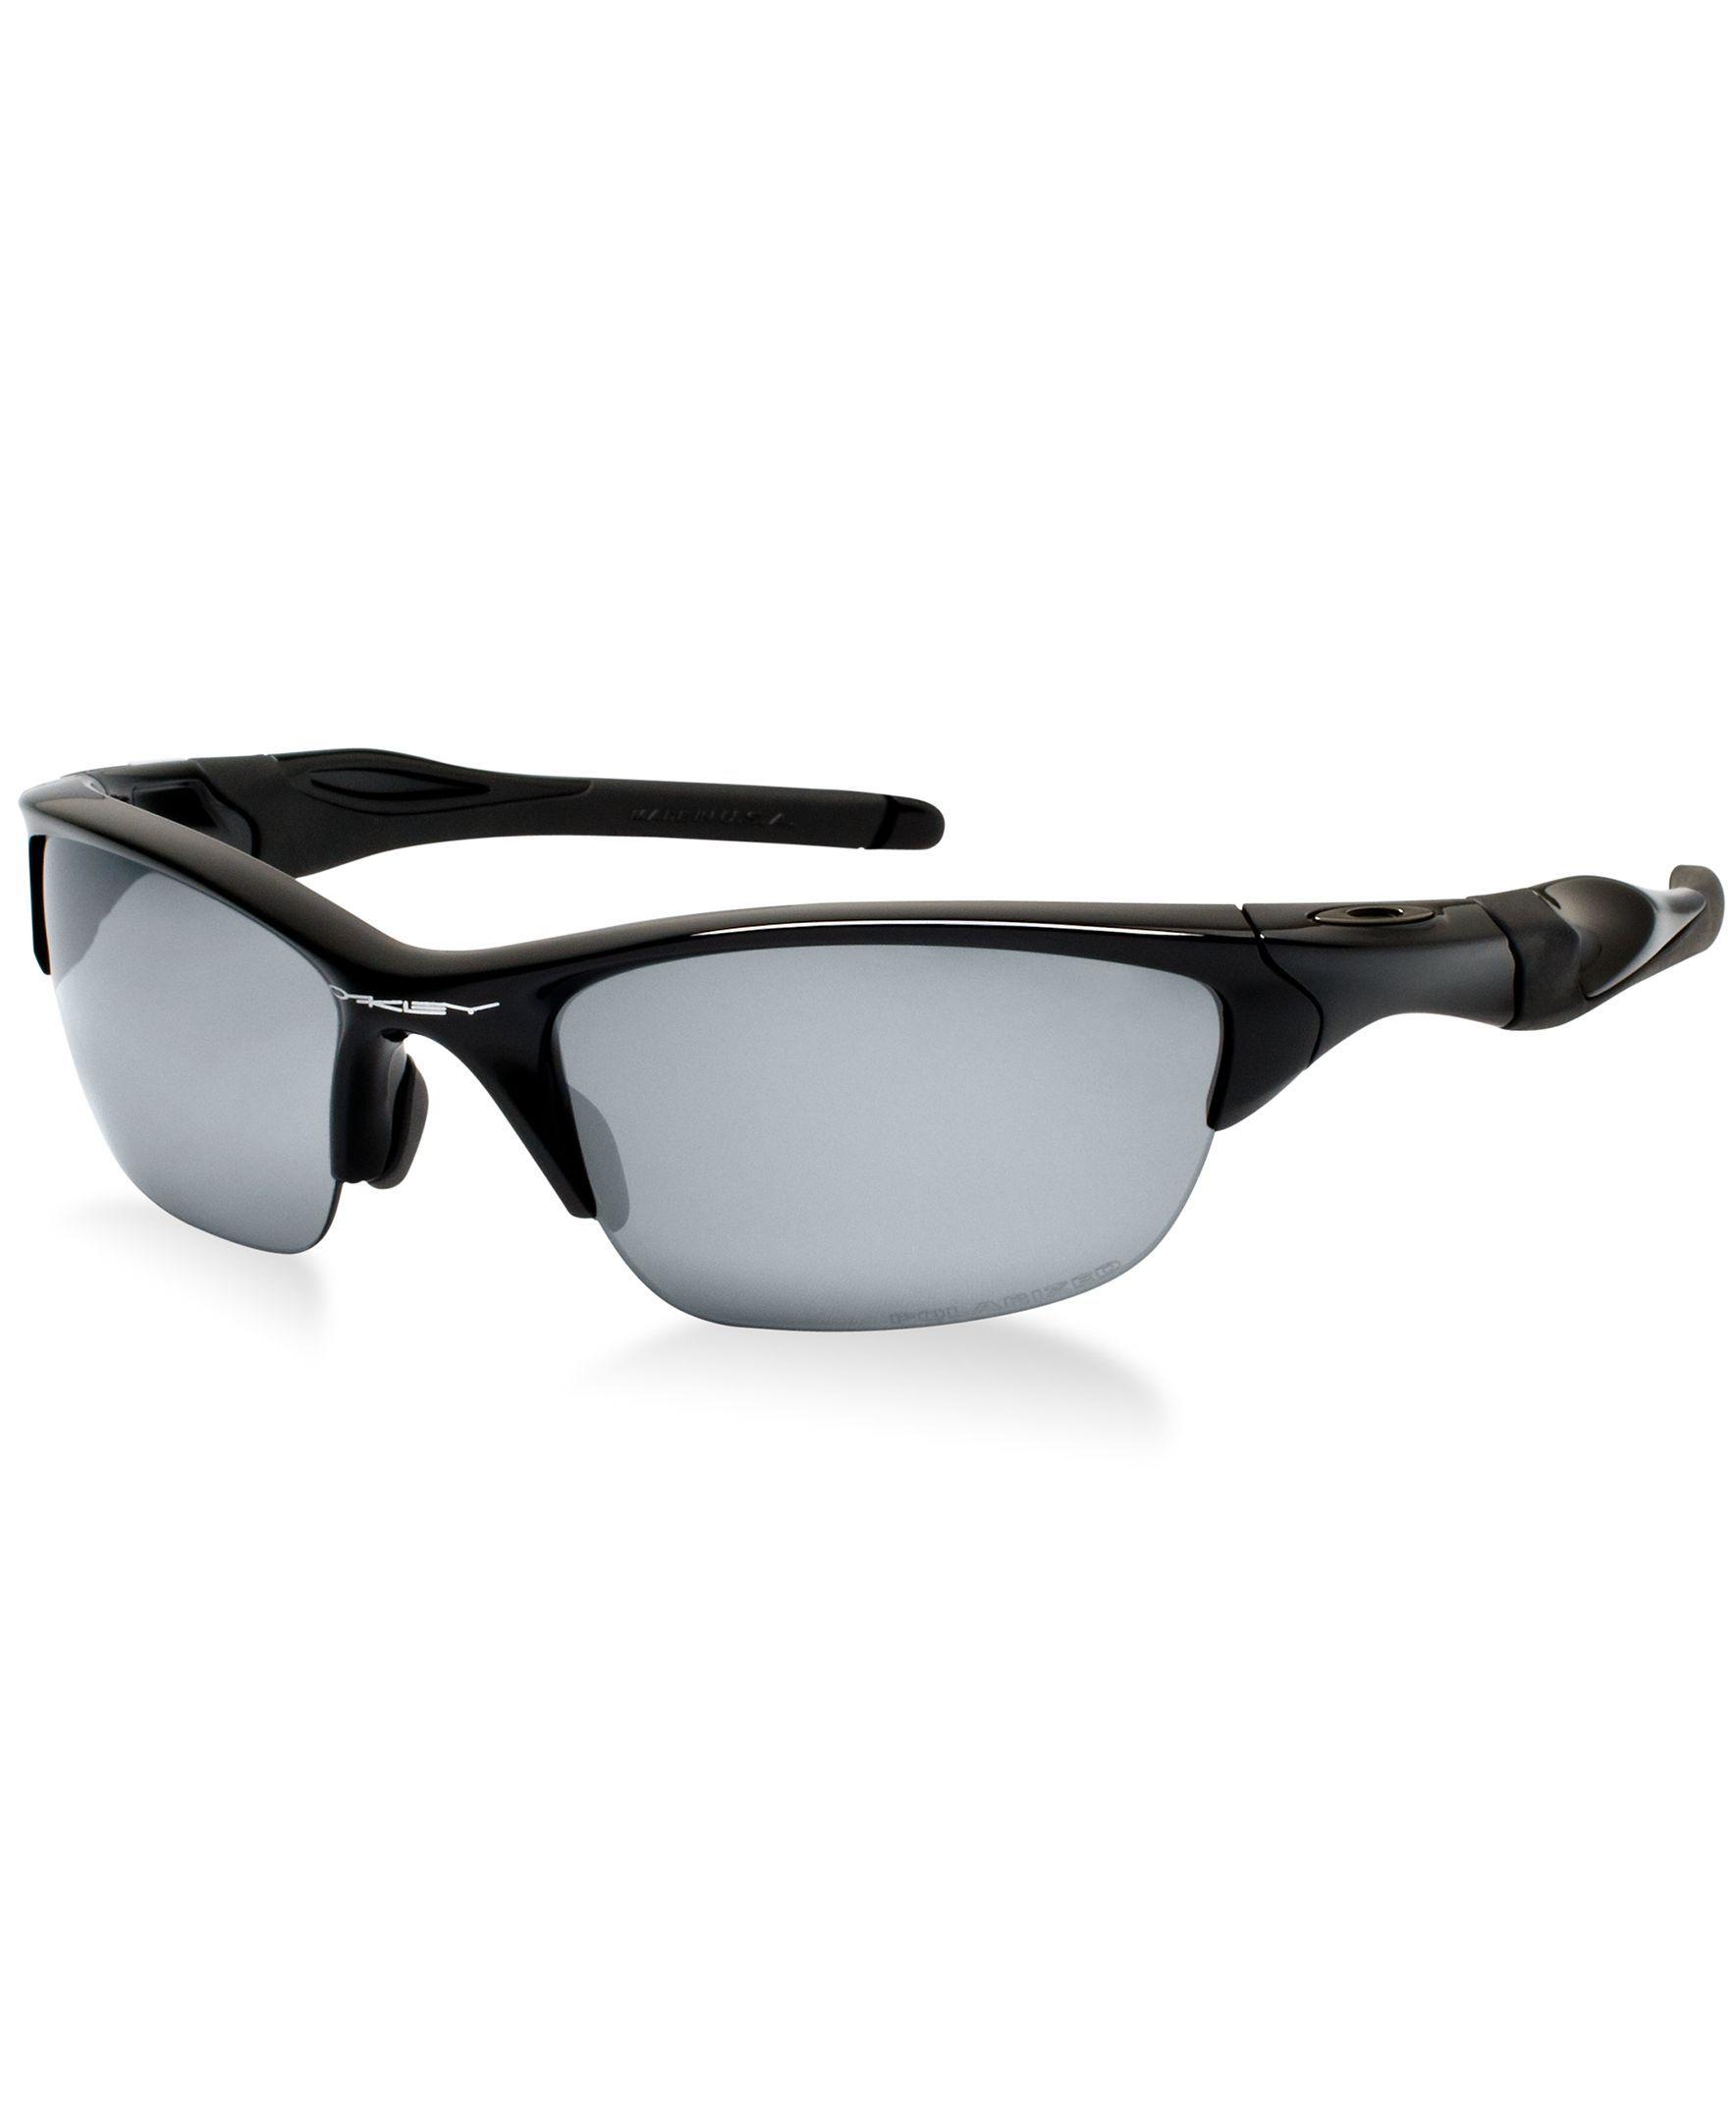 Oakley Polarized Sunglasses, OO9144P